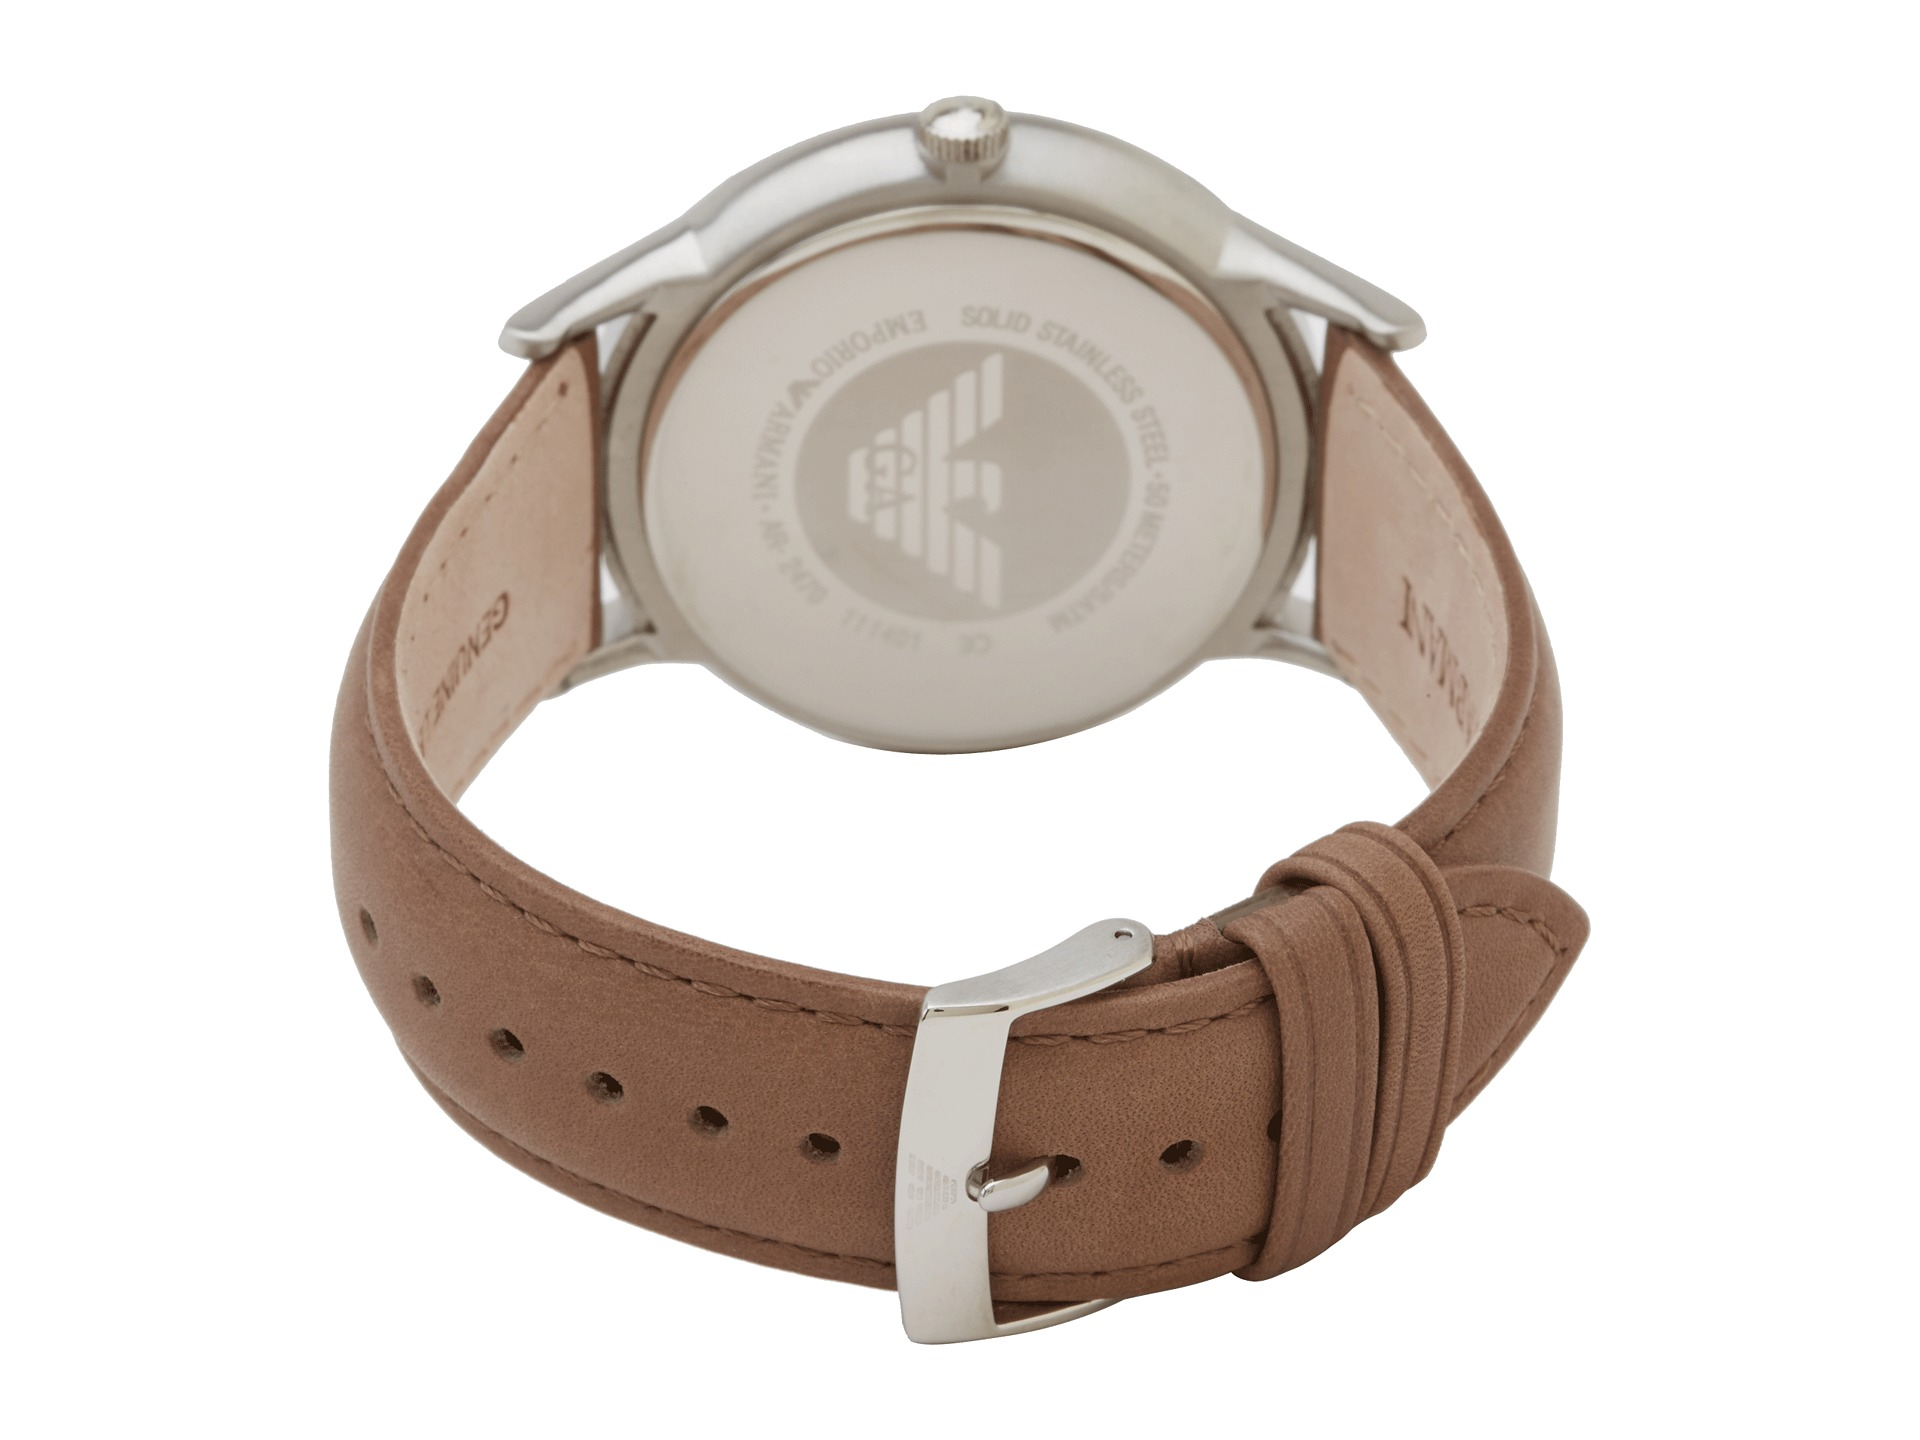 Đồng hồ nam Armani AR2470 chốt khóa